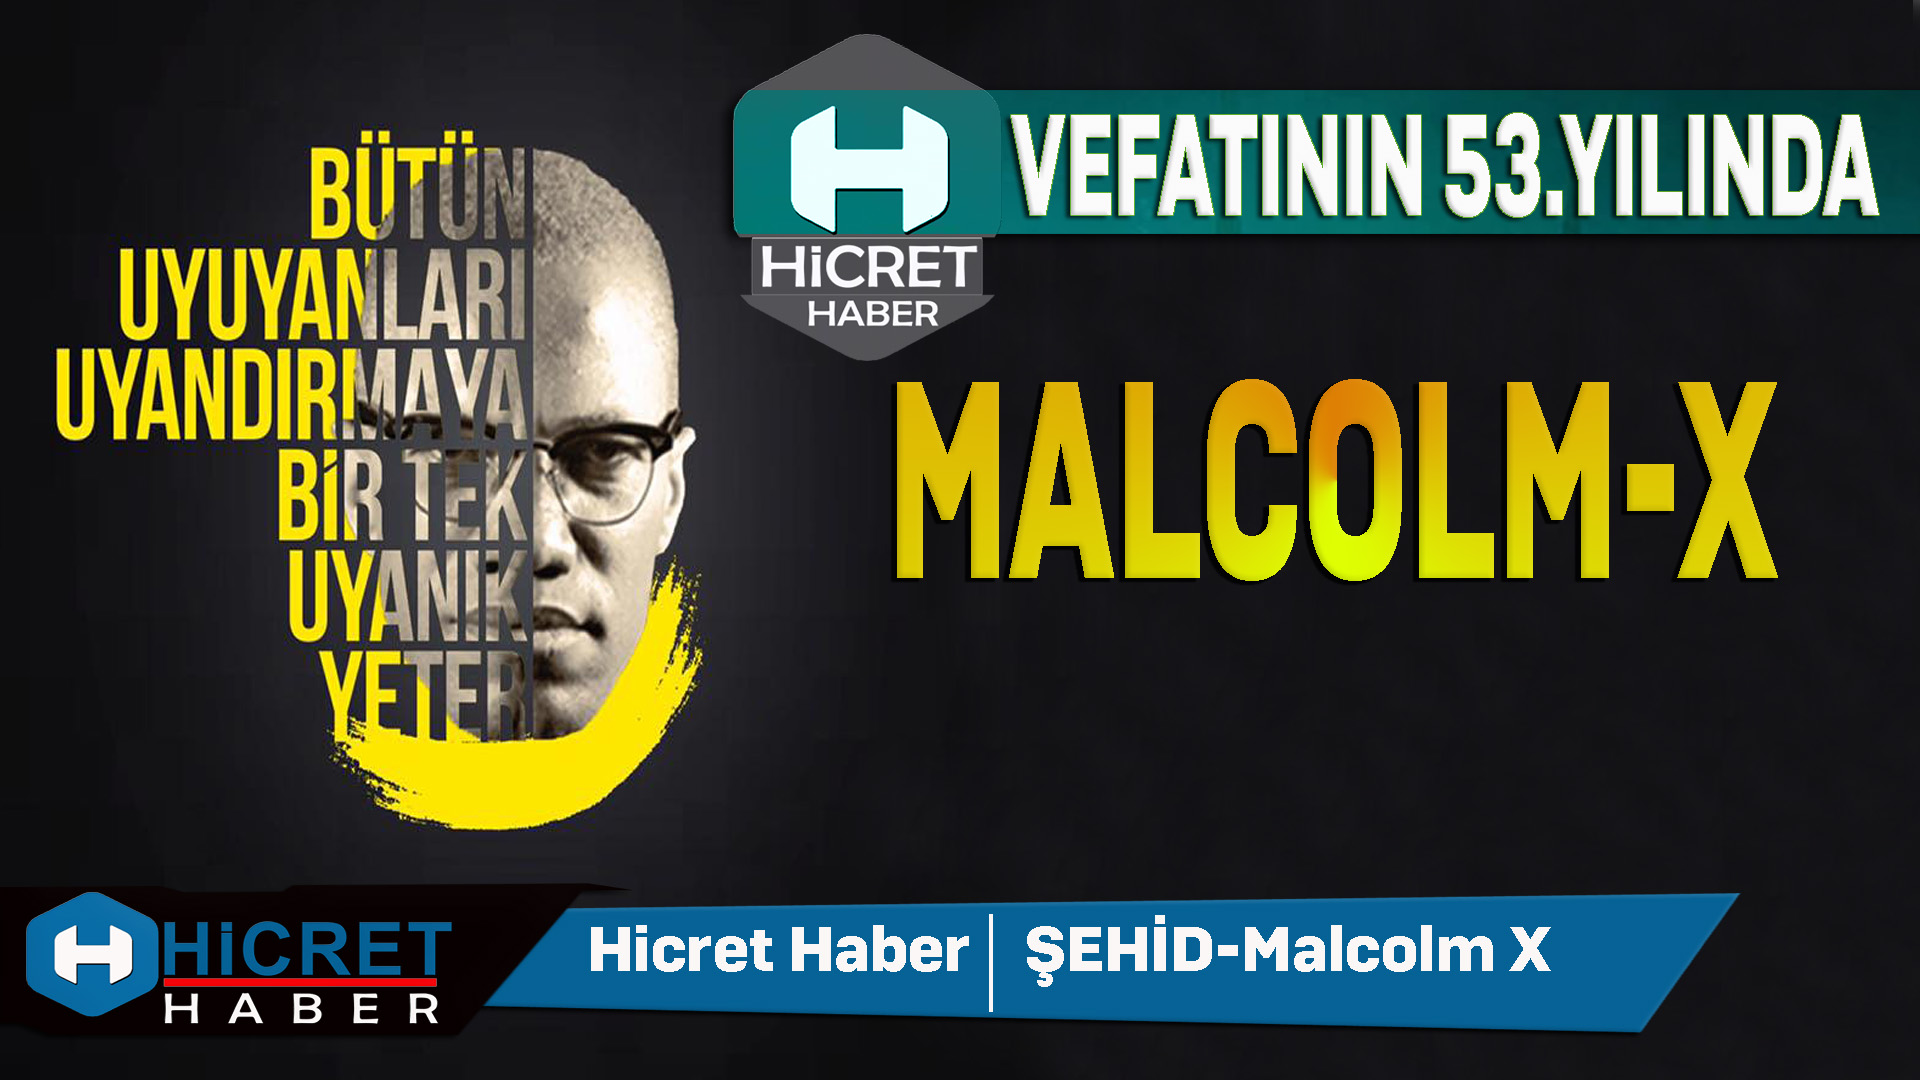 Vefatı'nın 53.Yılında Malcolm X